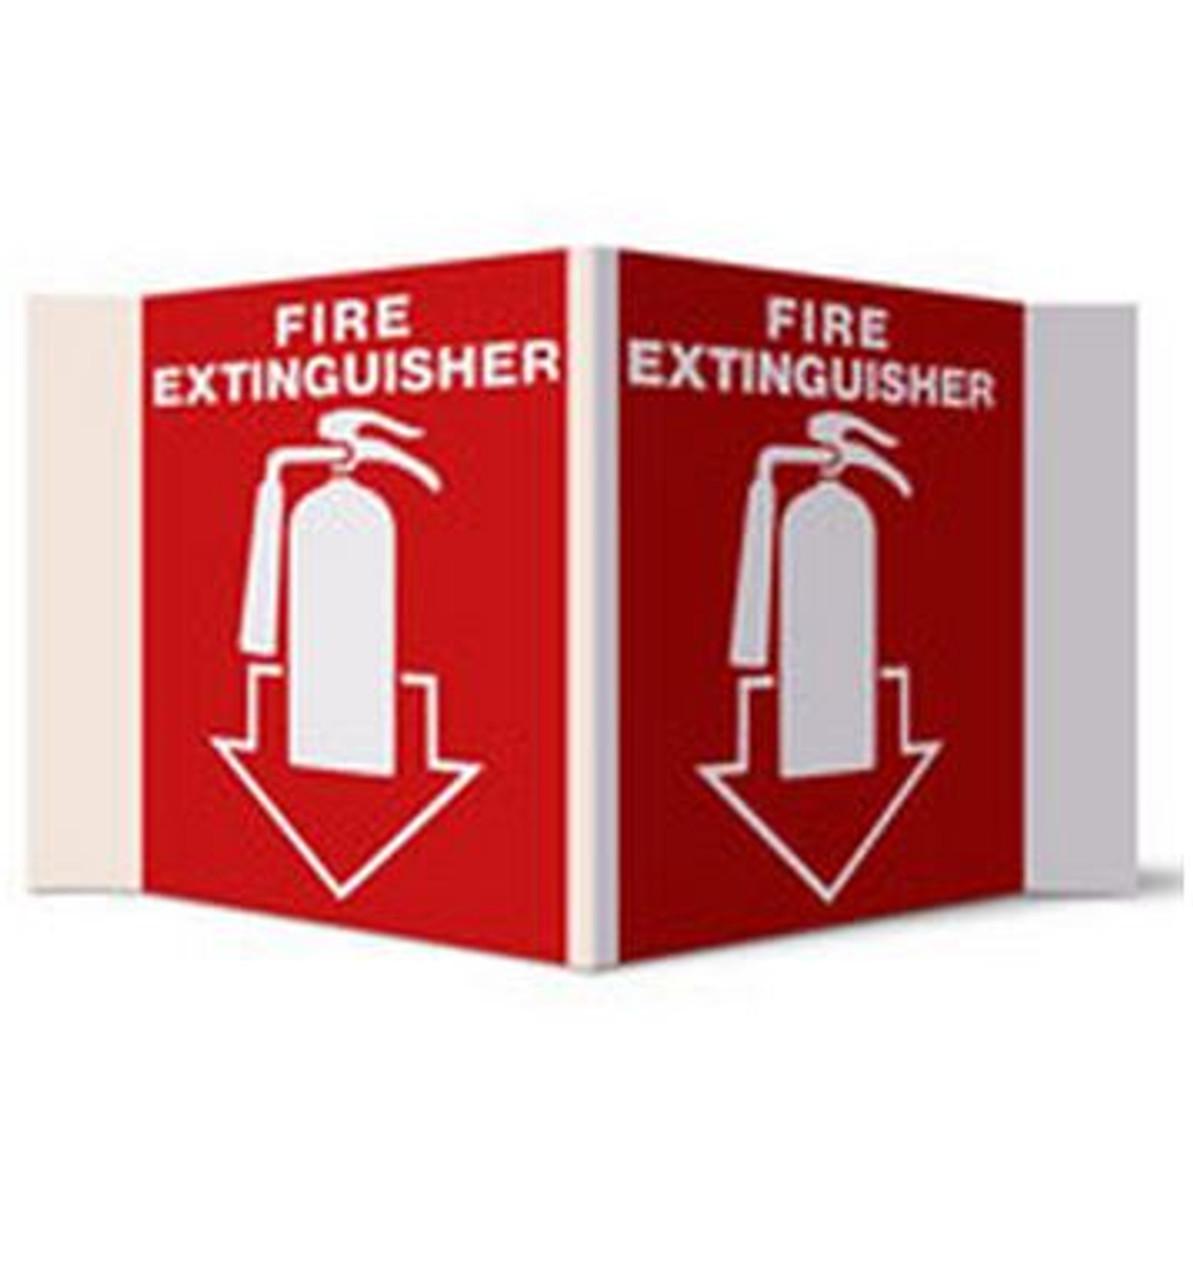 PTD-182 - 3-D Rigid Plastic Fire Extinguisher Sign